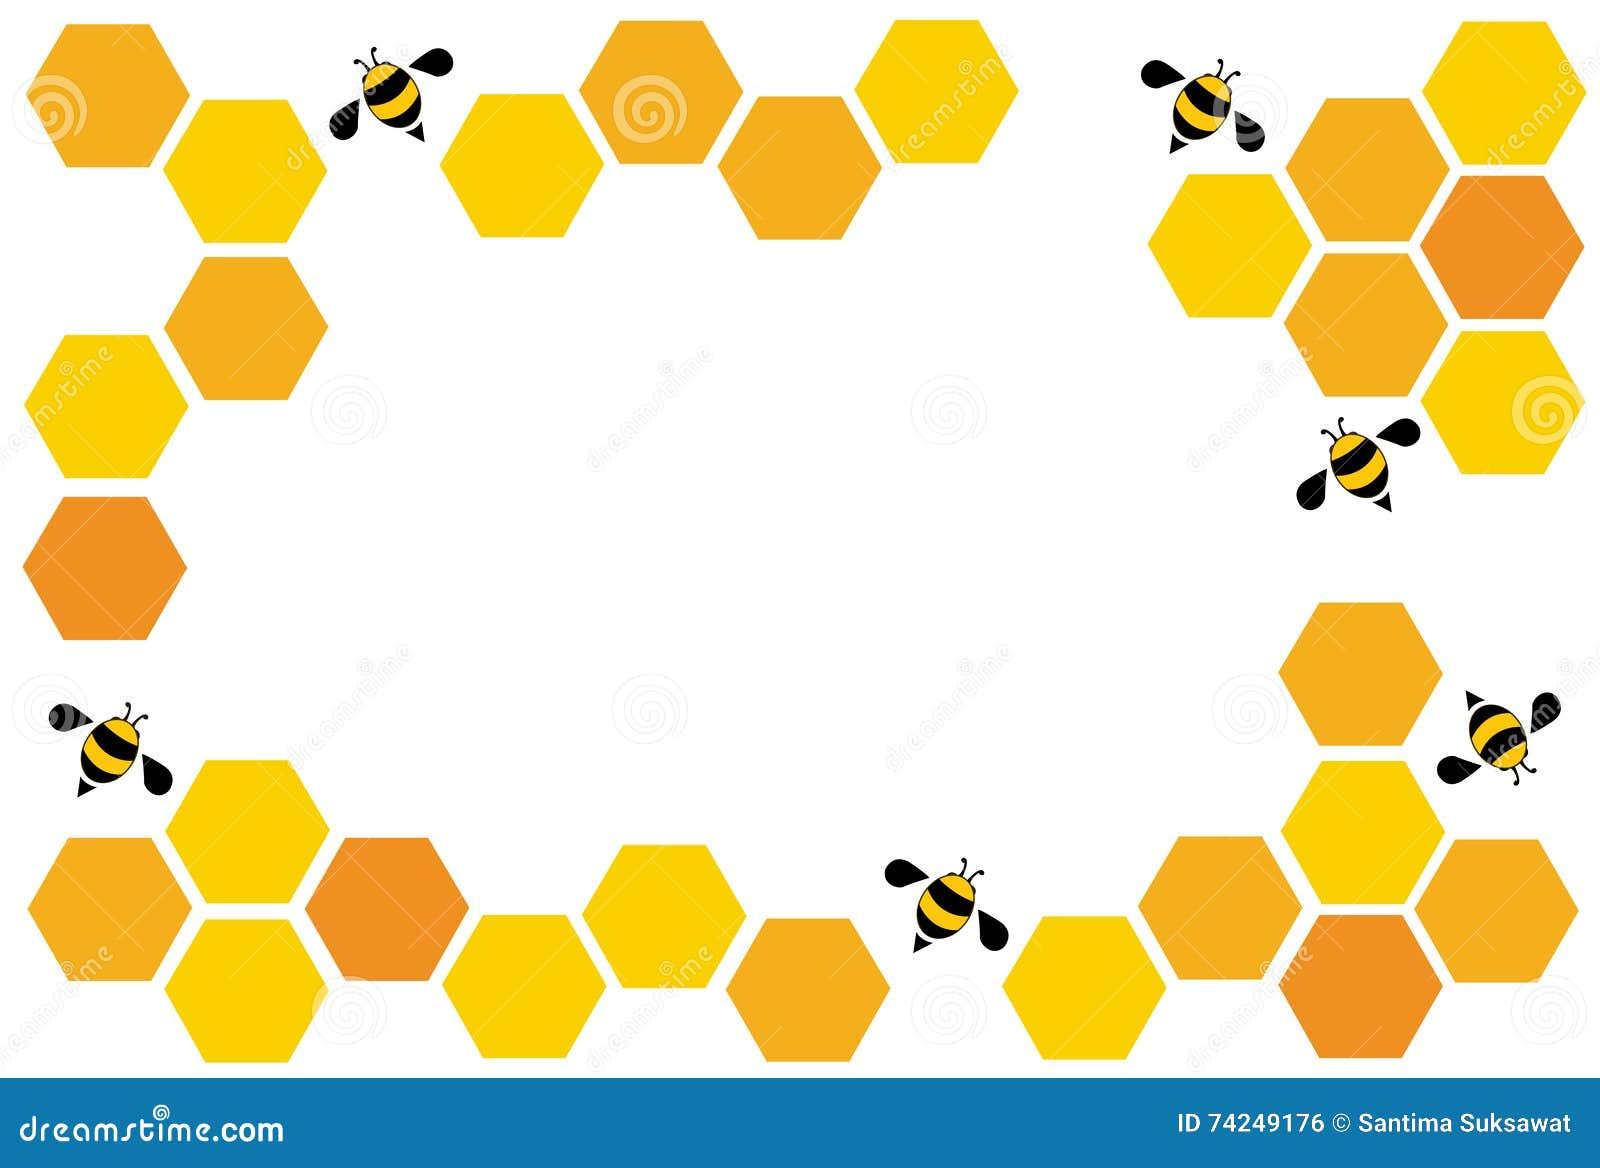 BG Hive connector | AVForums